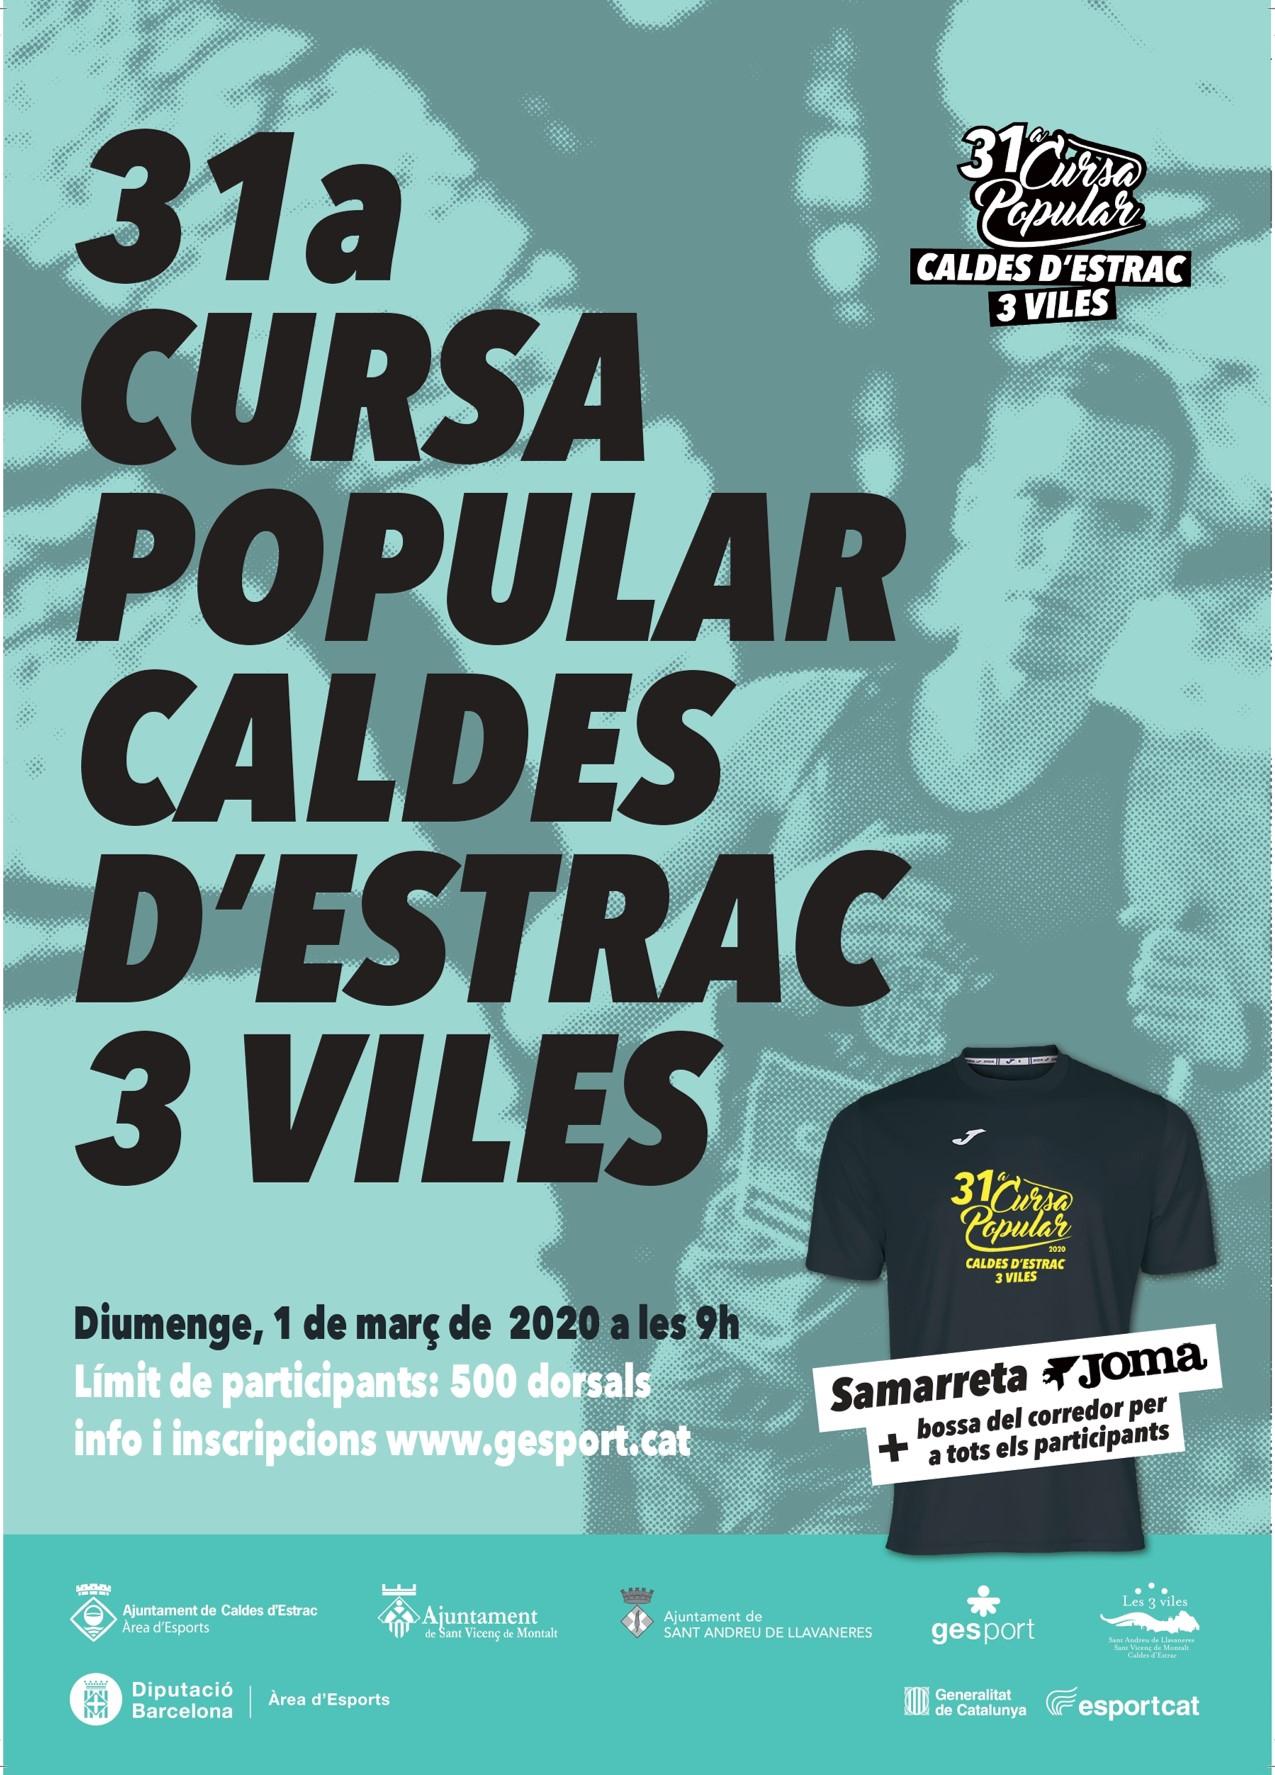 http://www.caldetes.cat/ARXIUS/2020/Esports/cursa_popular/Cartell_Cursa_Caldes_10k_2020.jpg